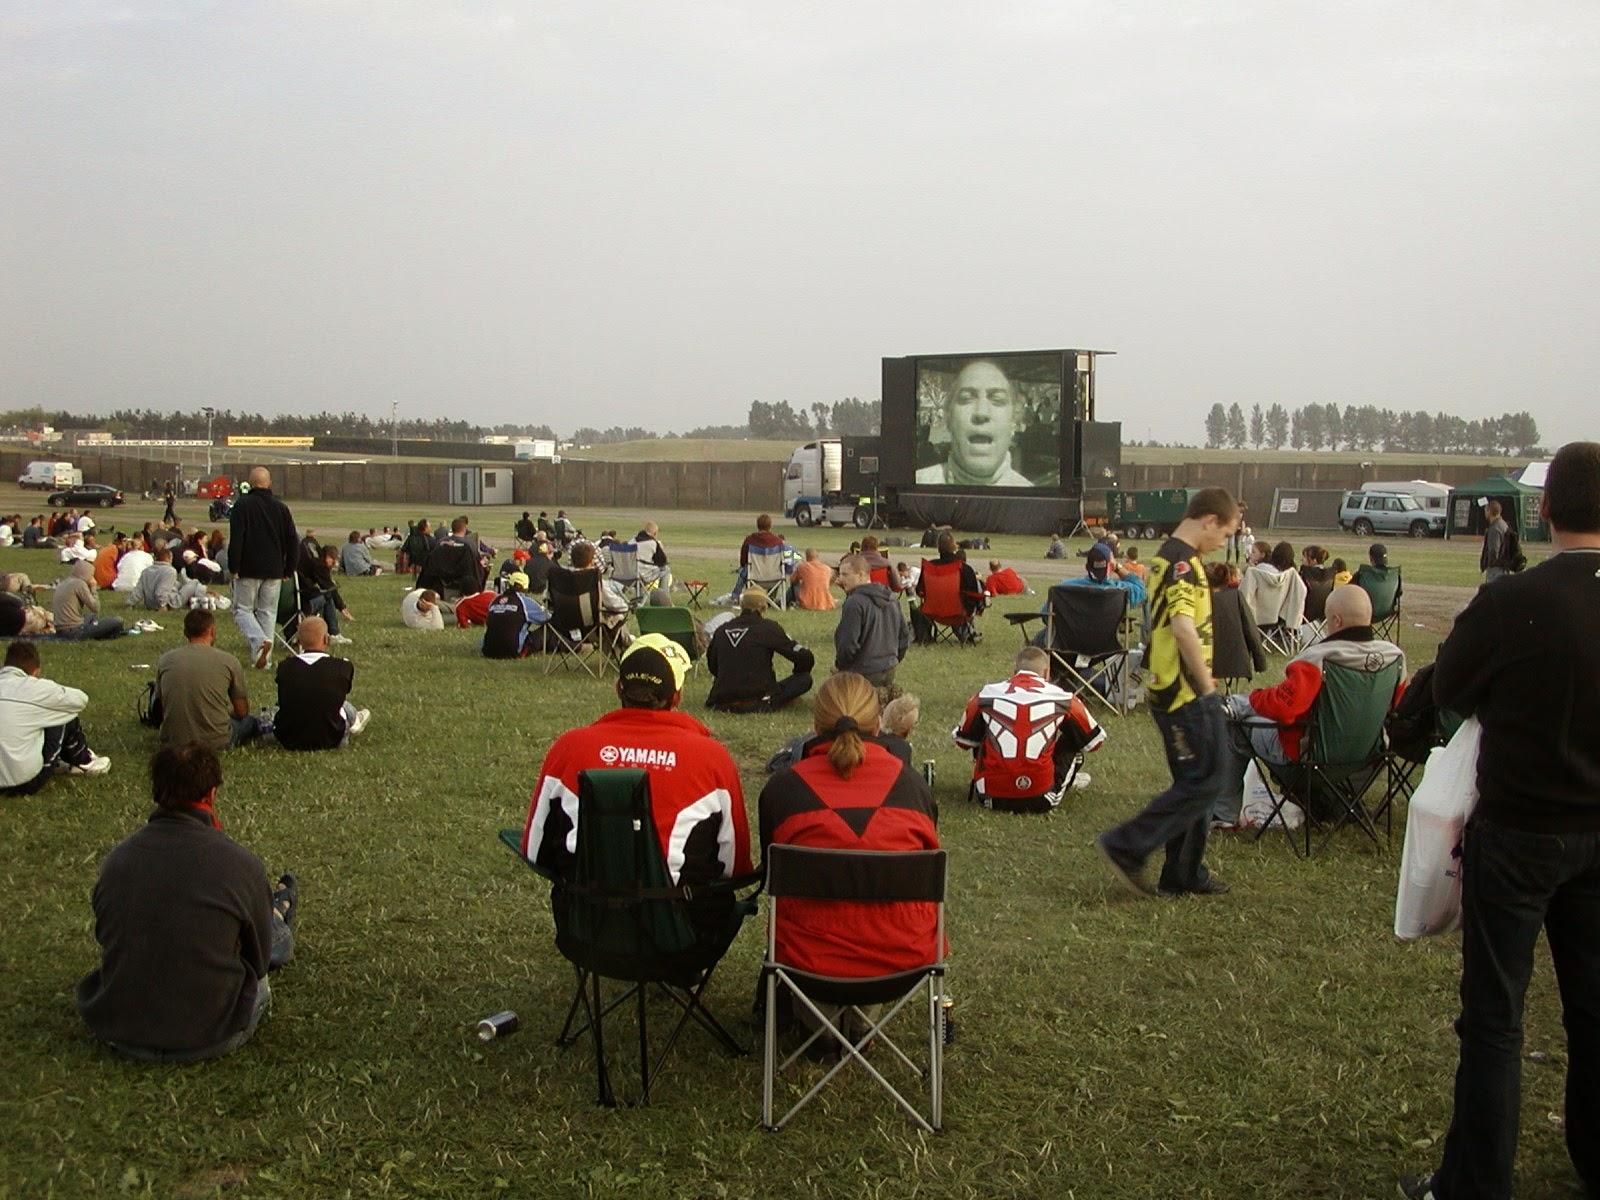 pantalla en el camping de Donington Park